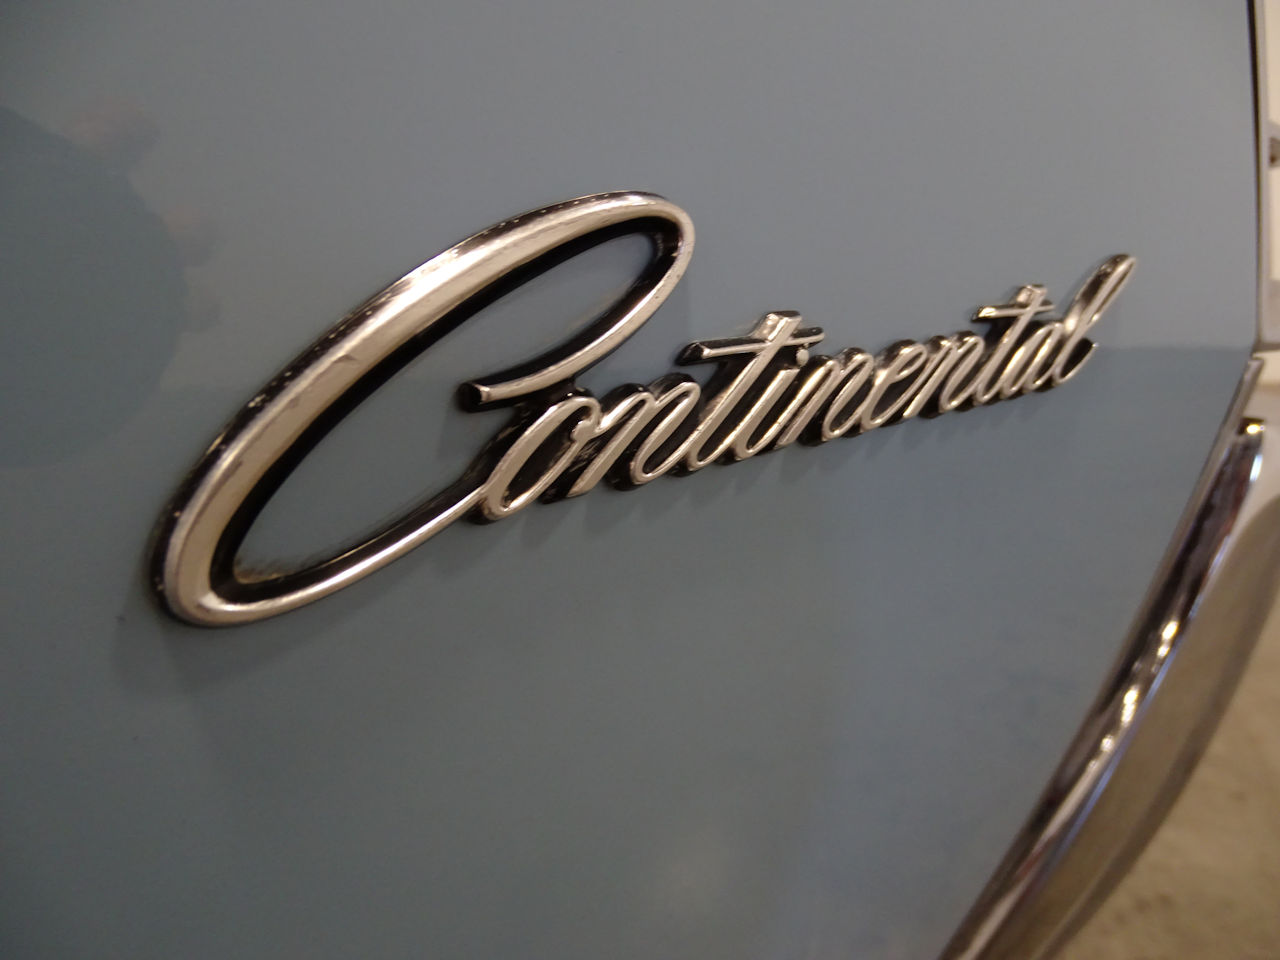 1970 Lincoln Continental 54